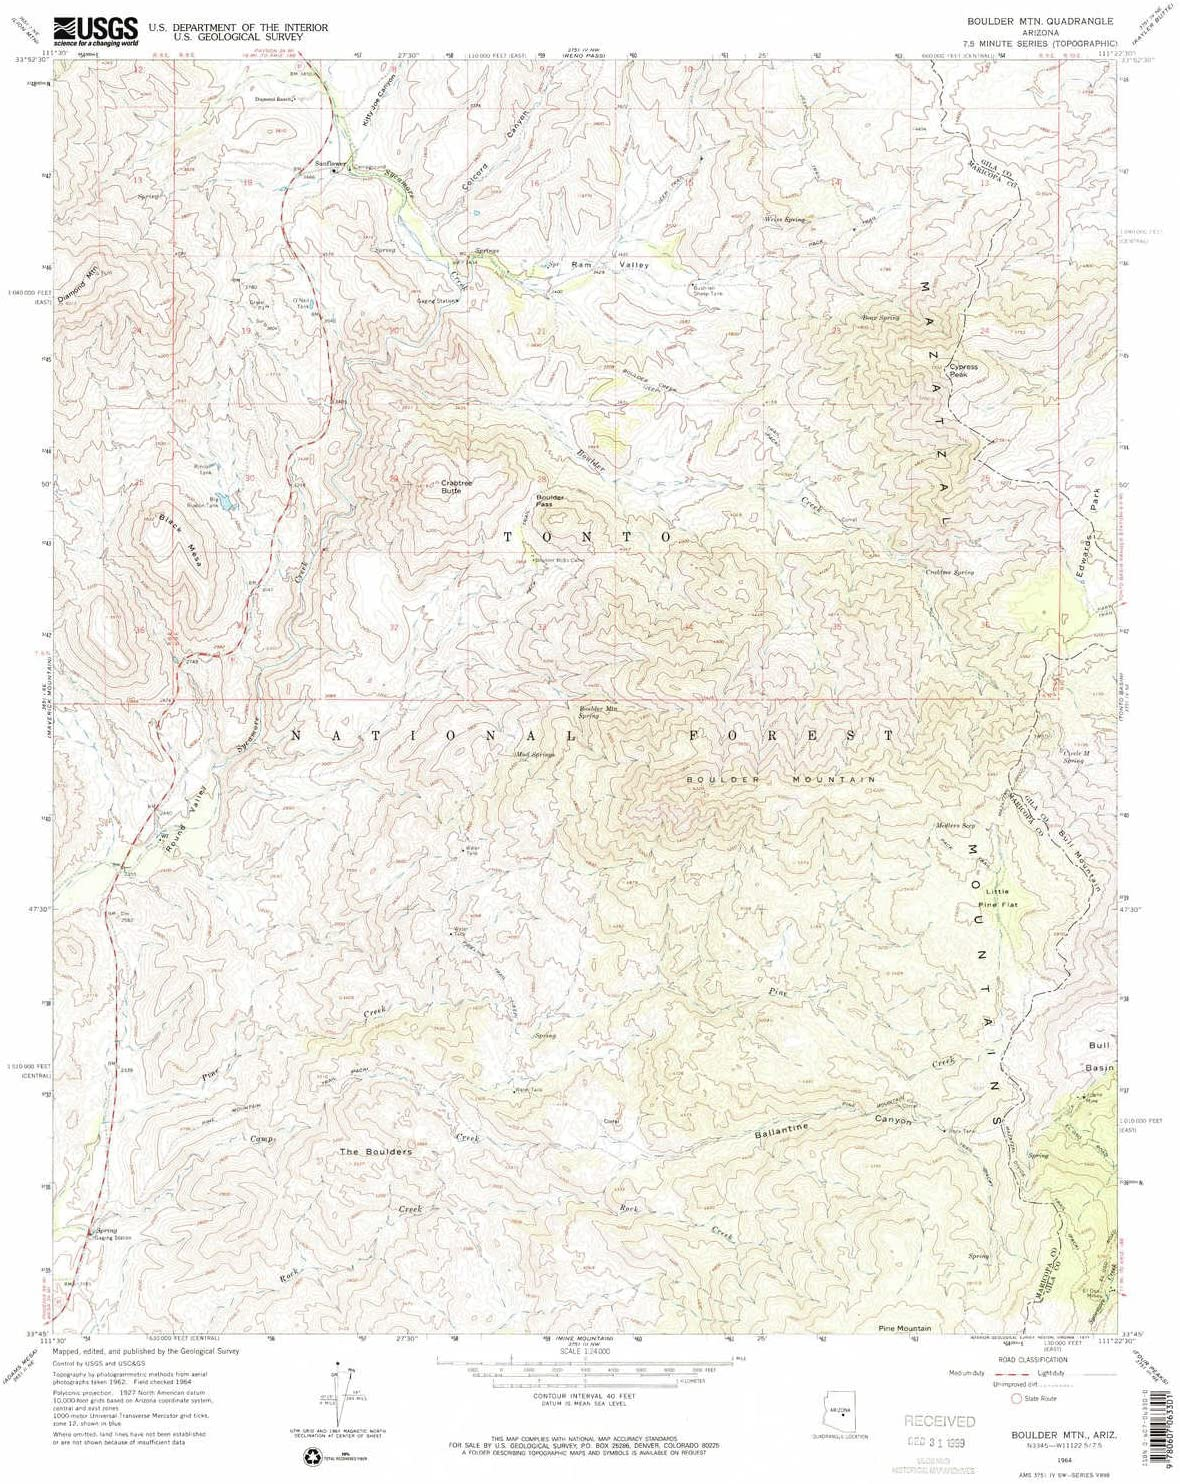 YellowMaps Boulder MTN AZ topo Columbus Mall map X Scale 7.5 New item Min 1:24000